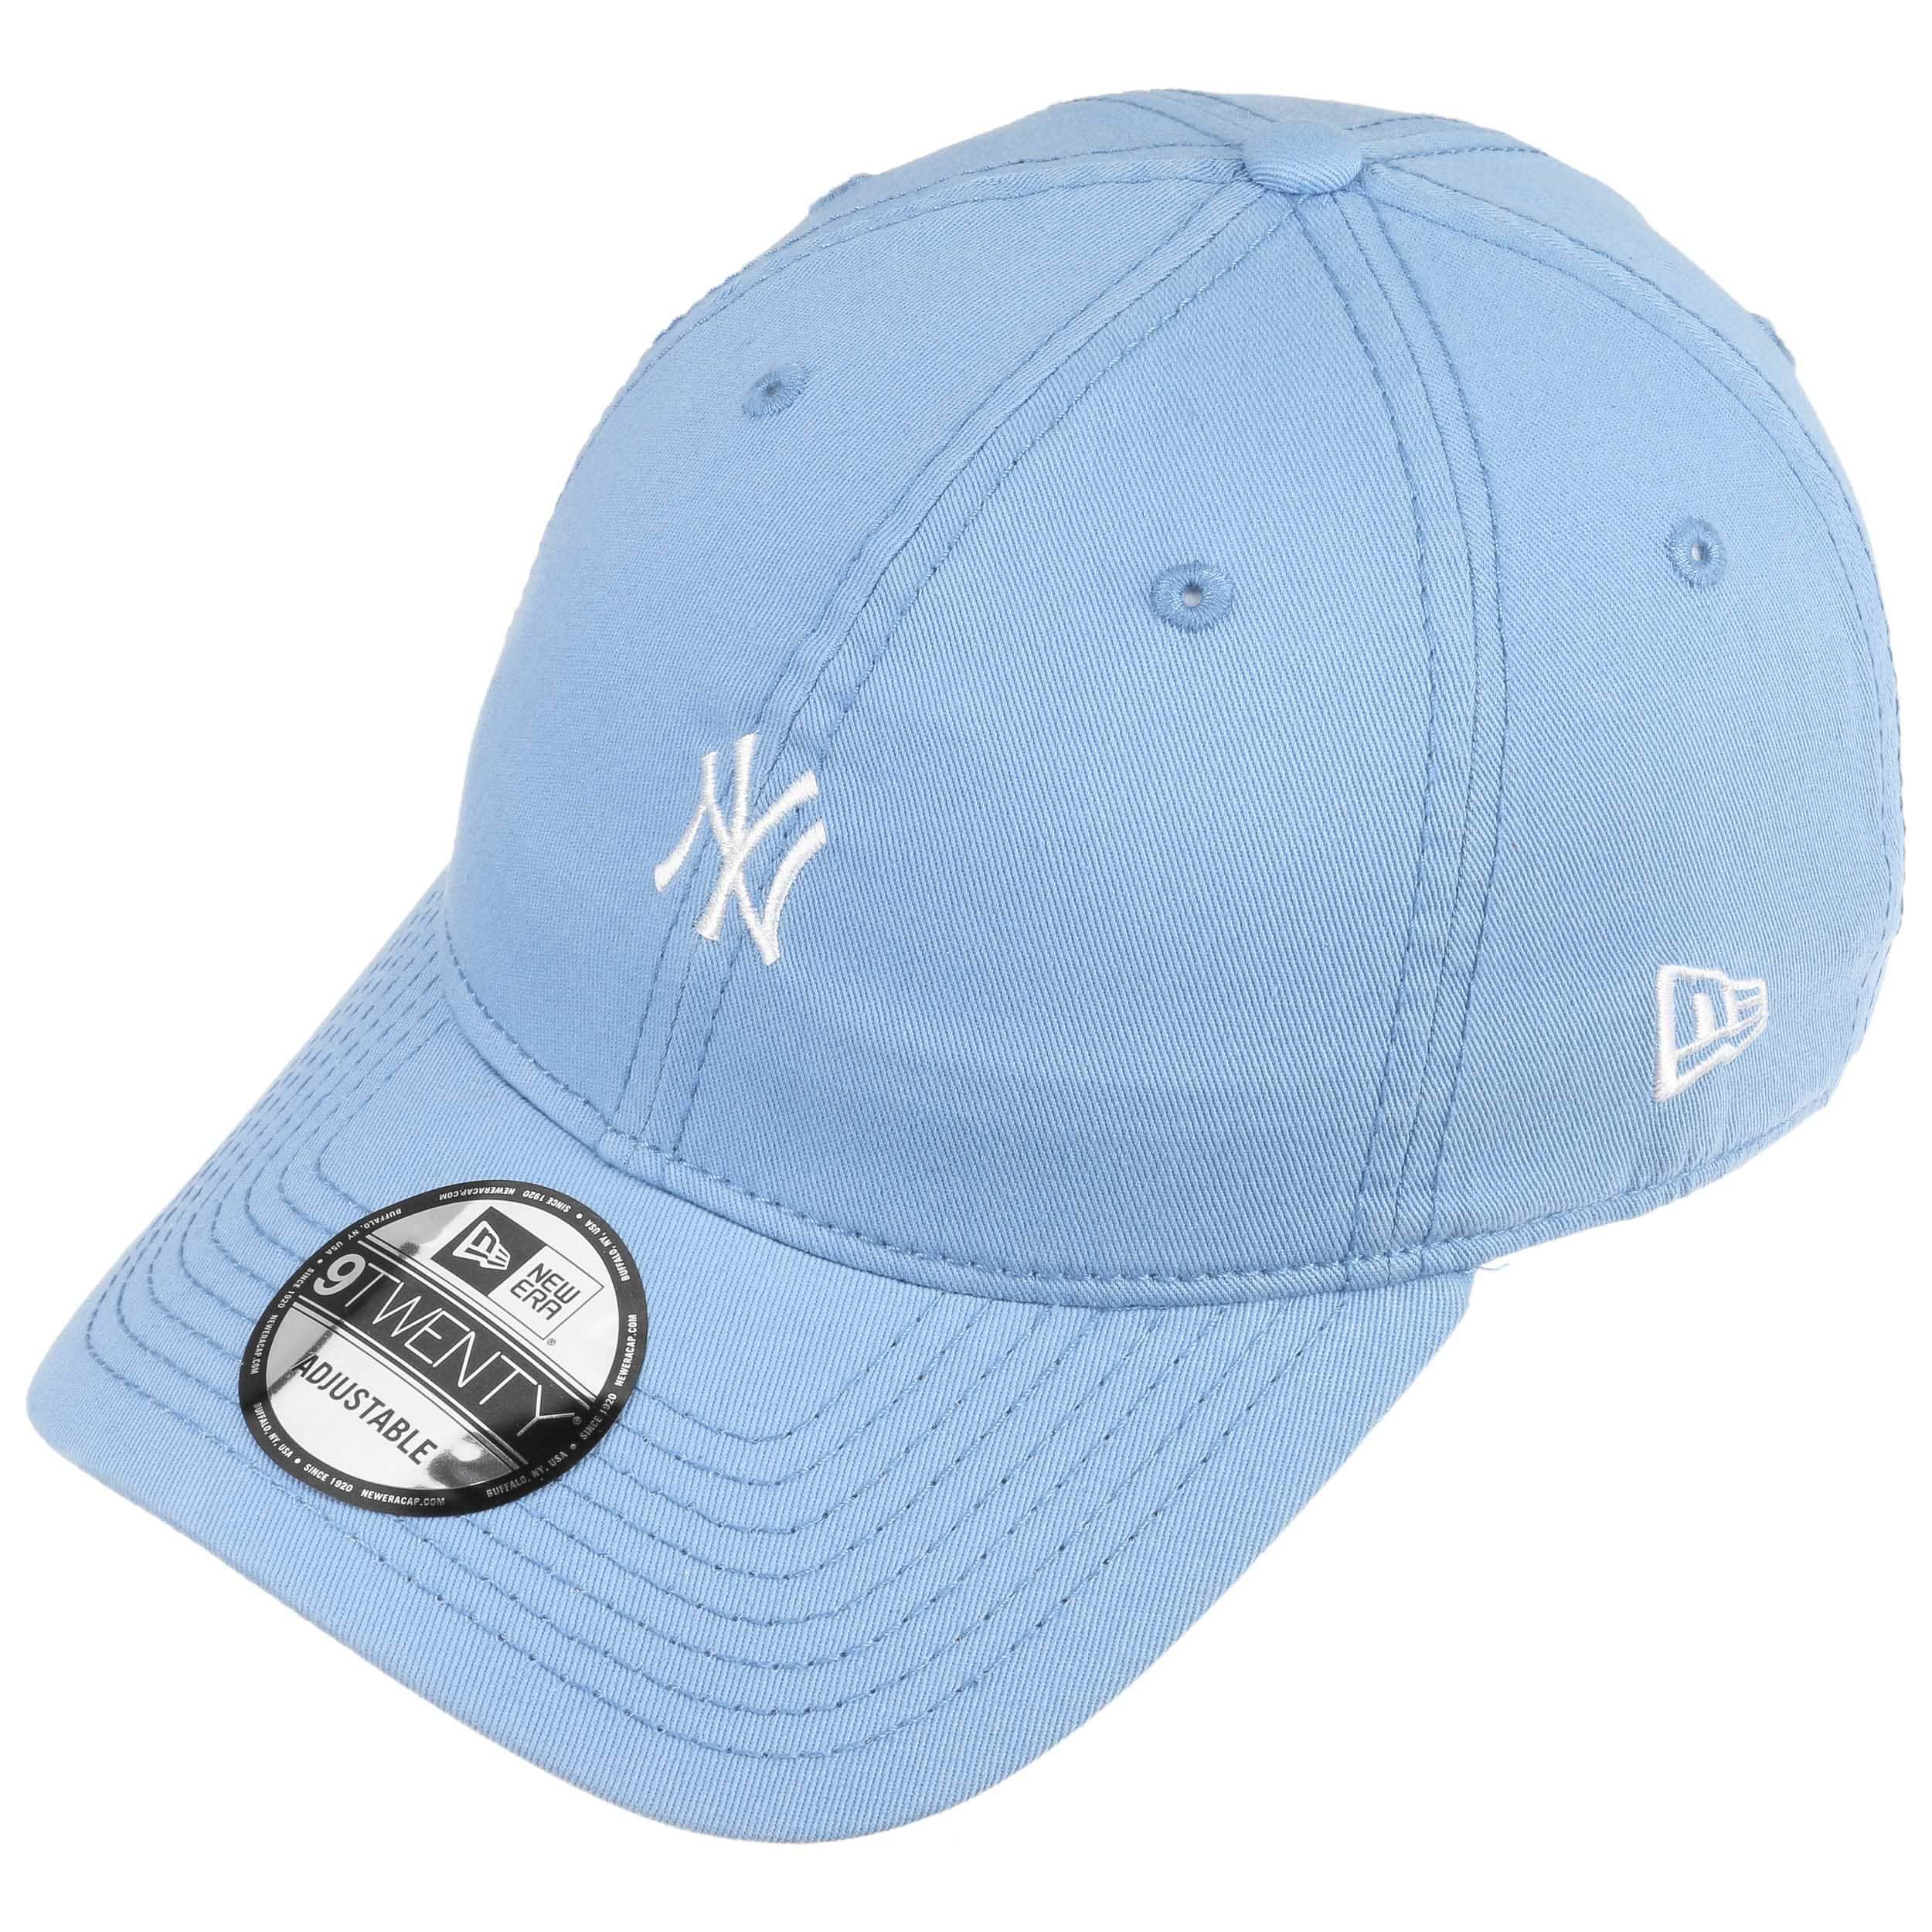 e3e4636a149 ... 9Twenty NY Yankees Pastel Cap by New Era - light blue 1 ...